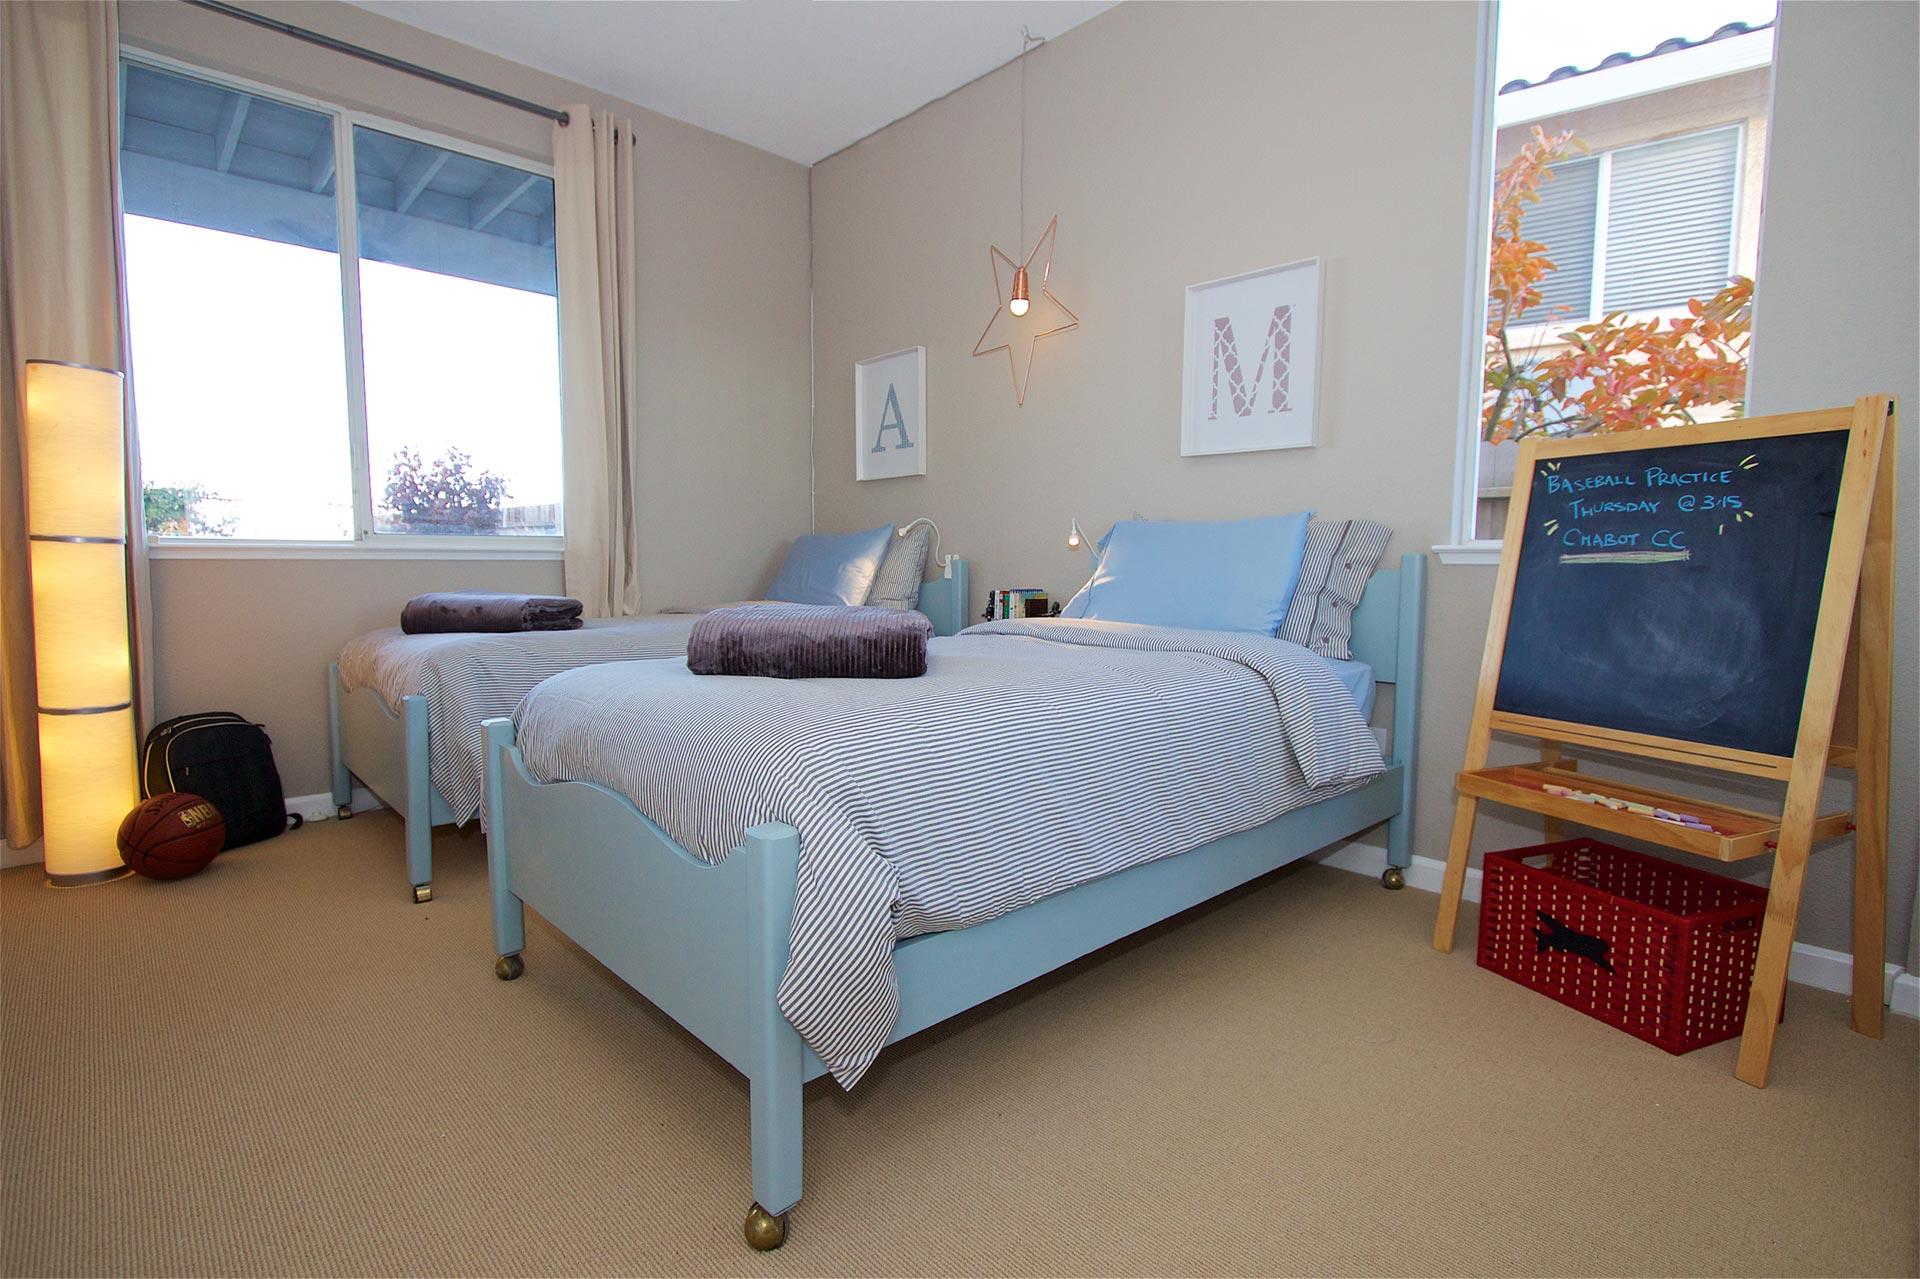 After-Bedroom 2